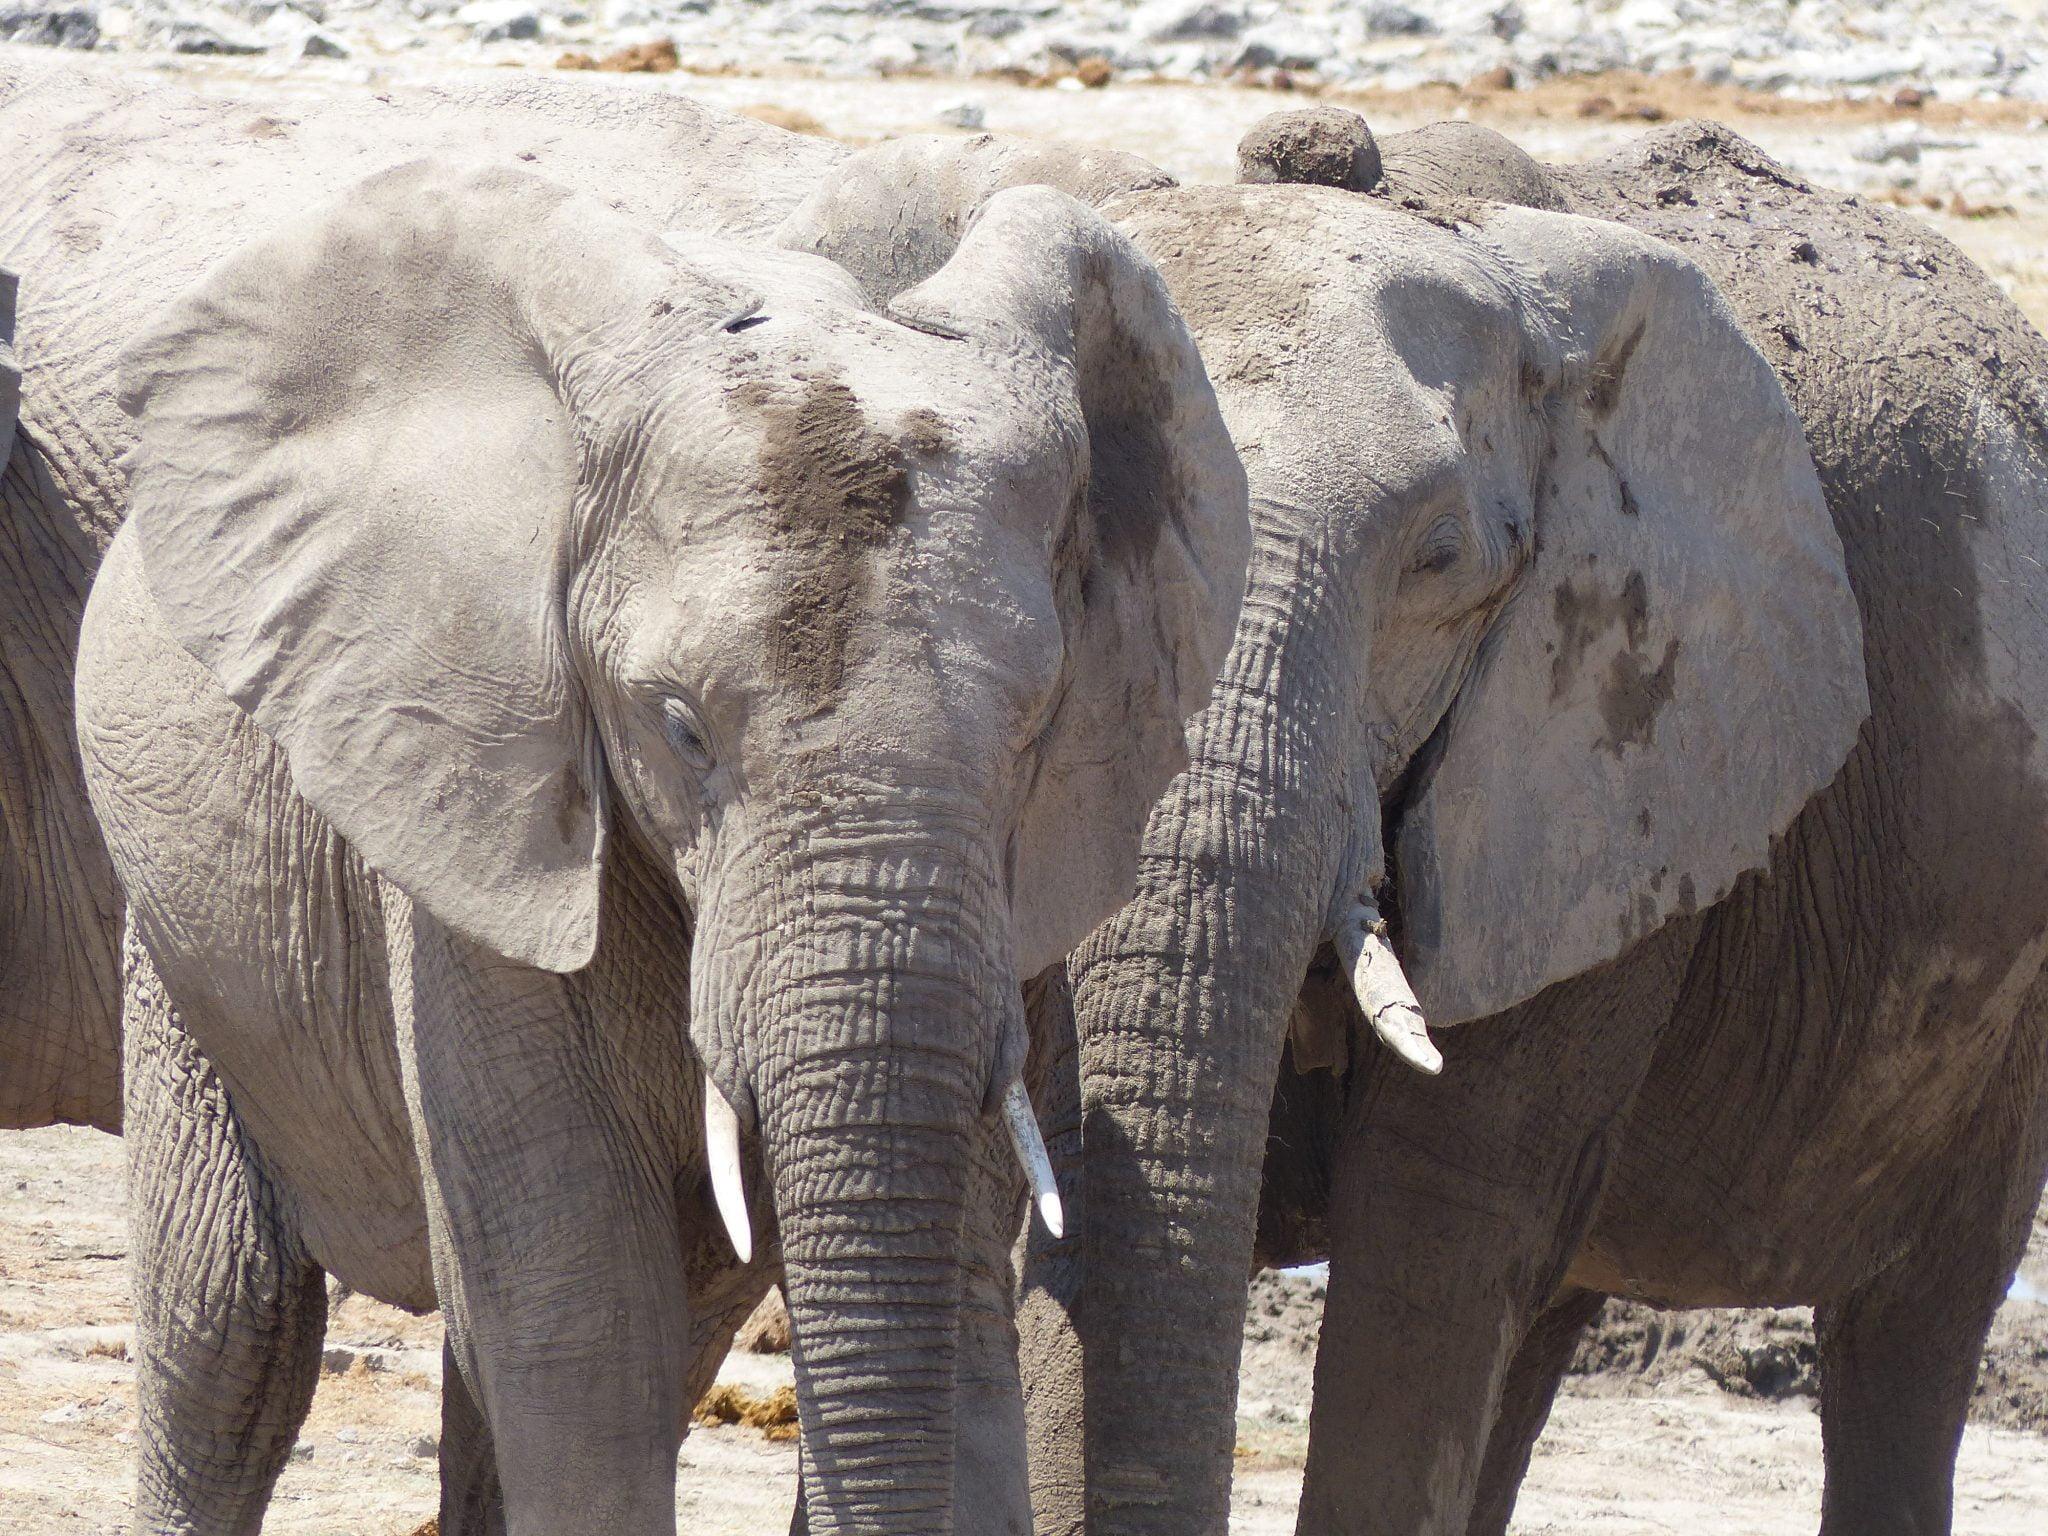 Elephants, Namibia